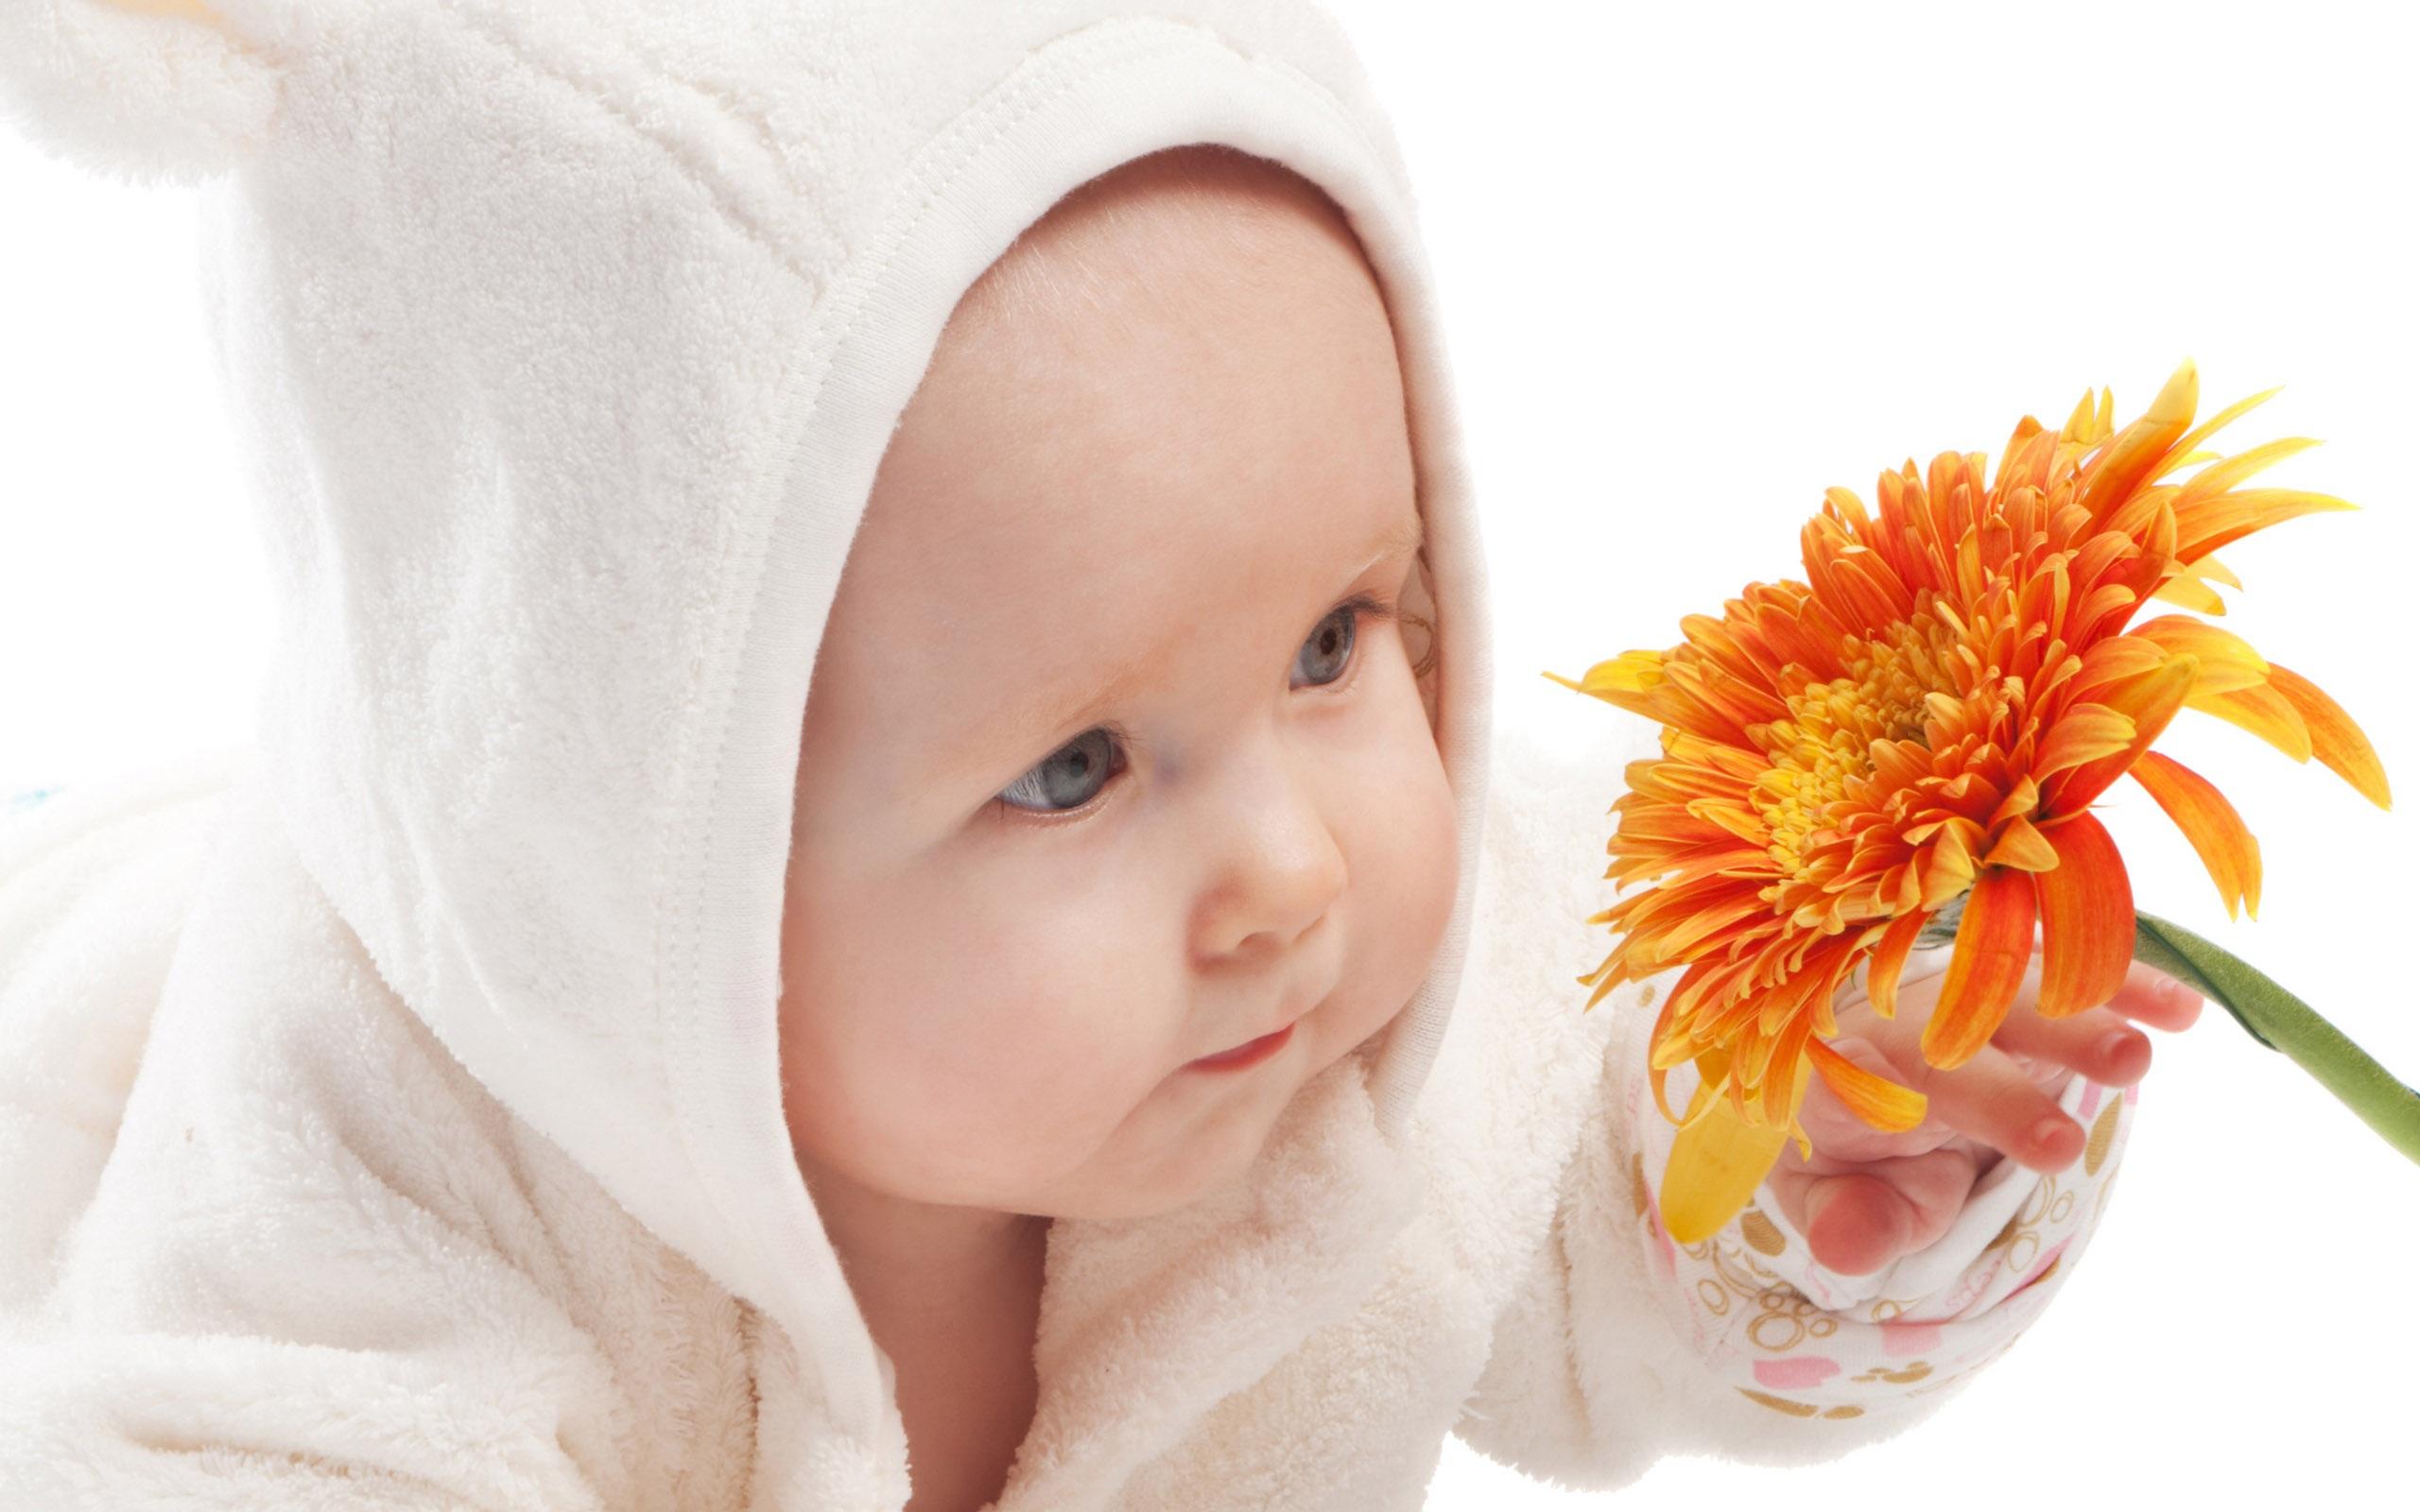 Cute-baby-take-the-flower_2560x1600.jpg